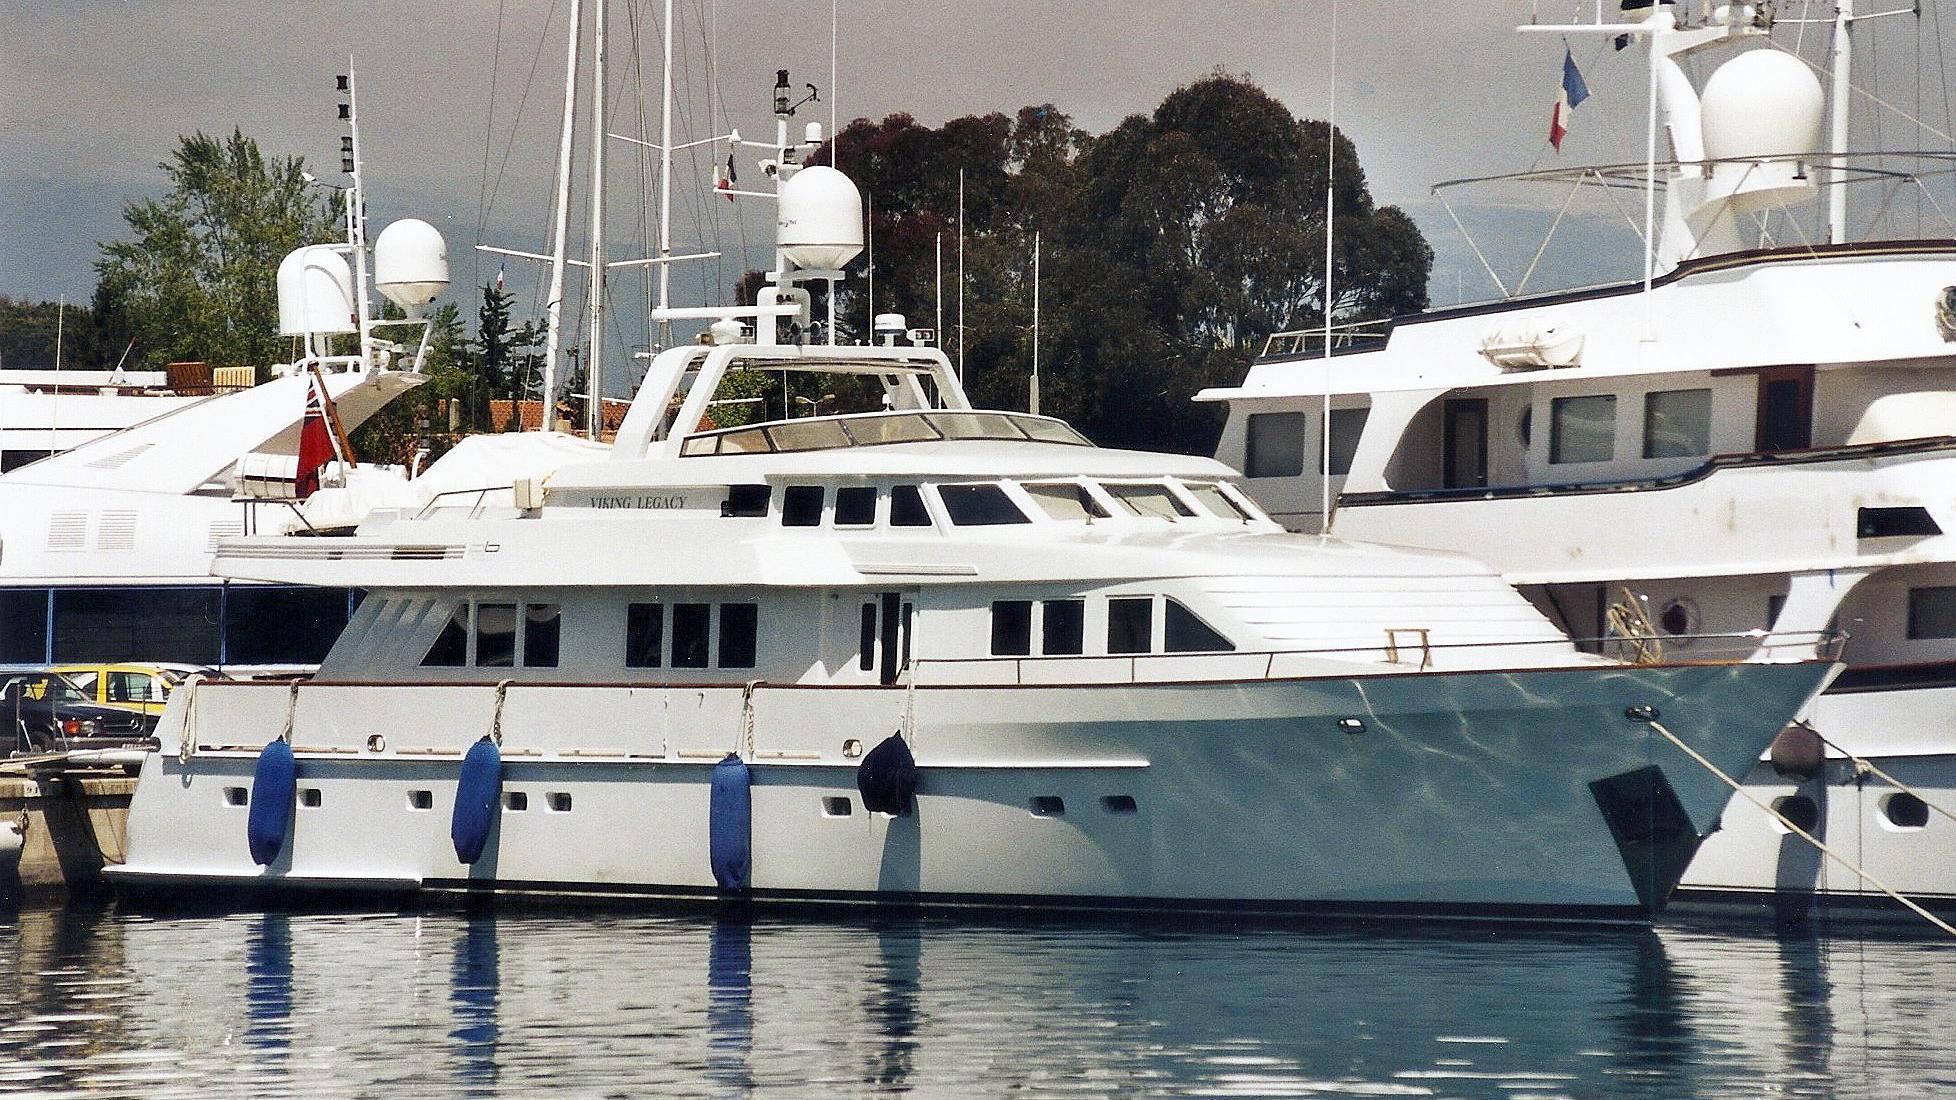 sea-raes-viking-legacy-motor-yacht-farocean-1997-29m-berth